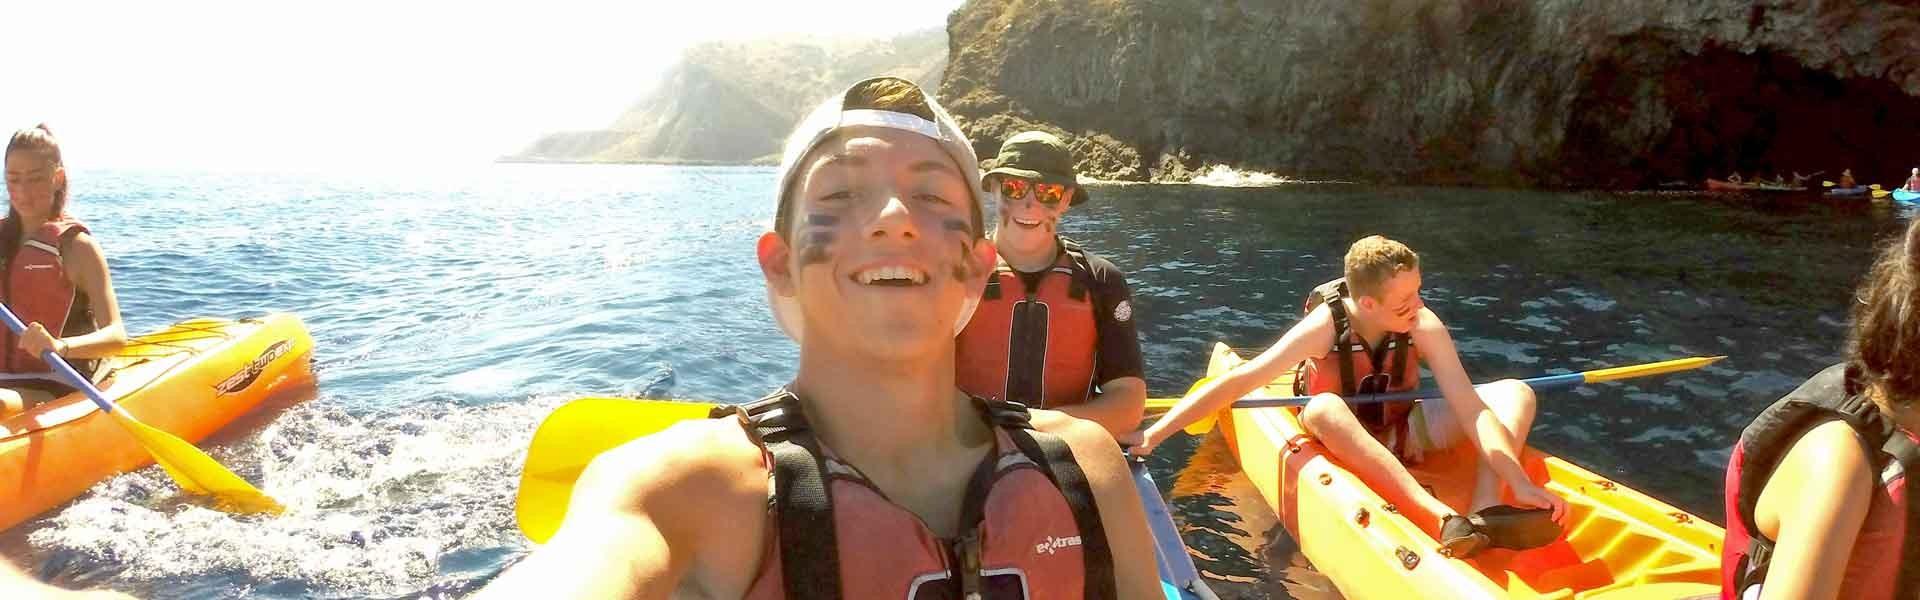 Grace Brethen California USA Canoeing Banner 2019